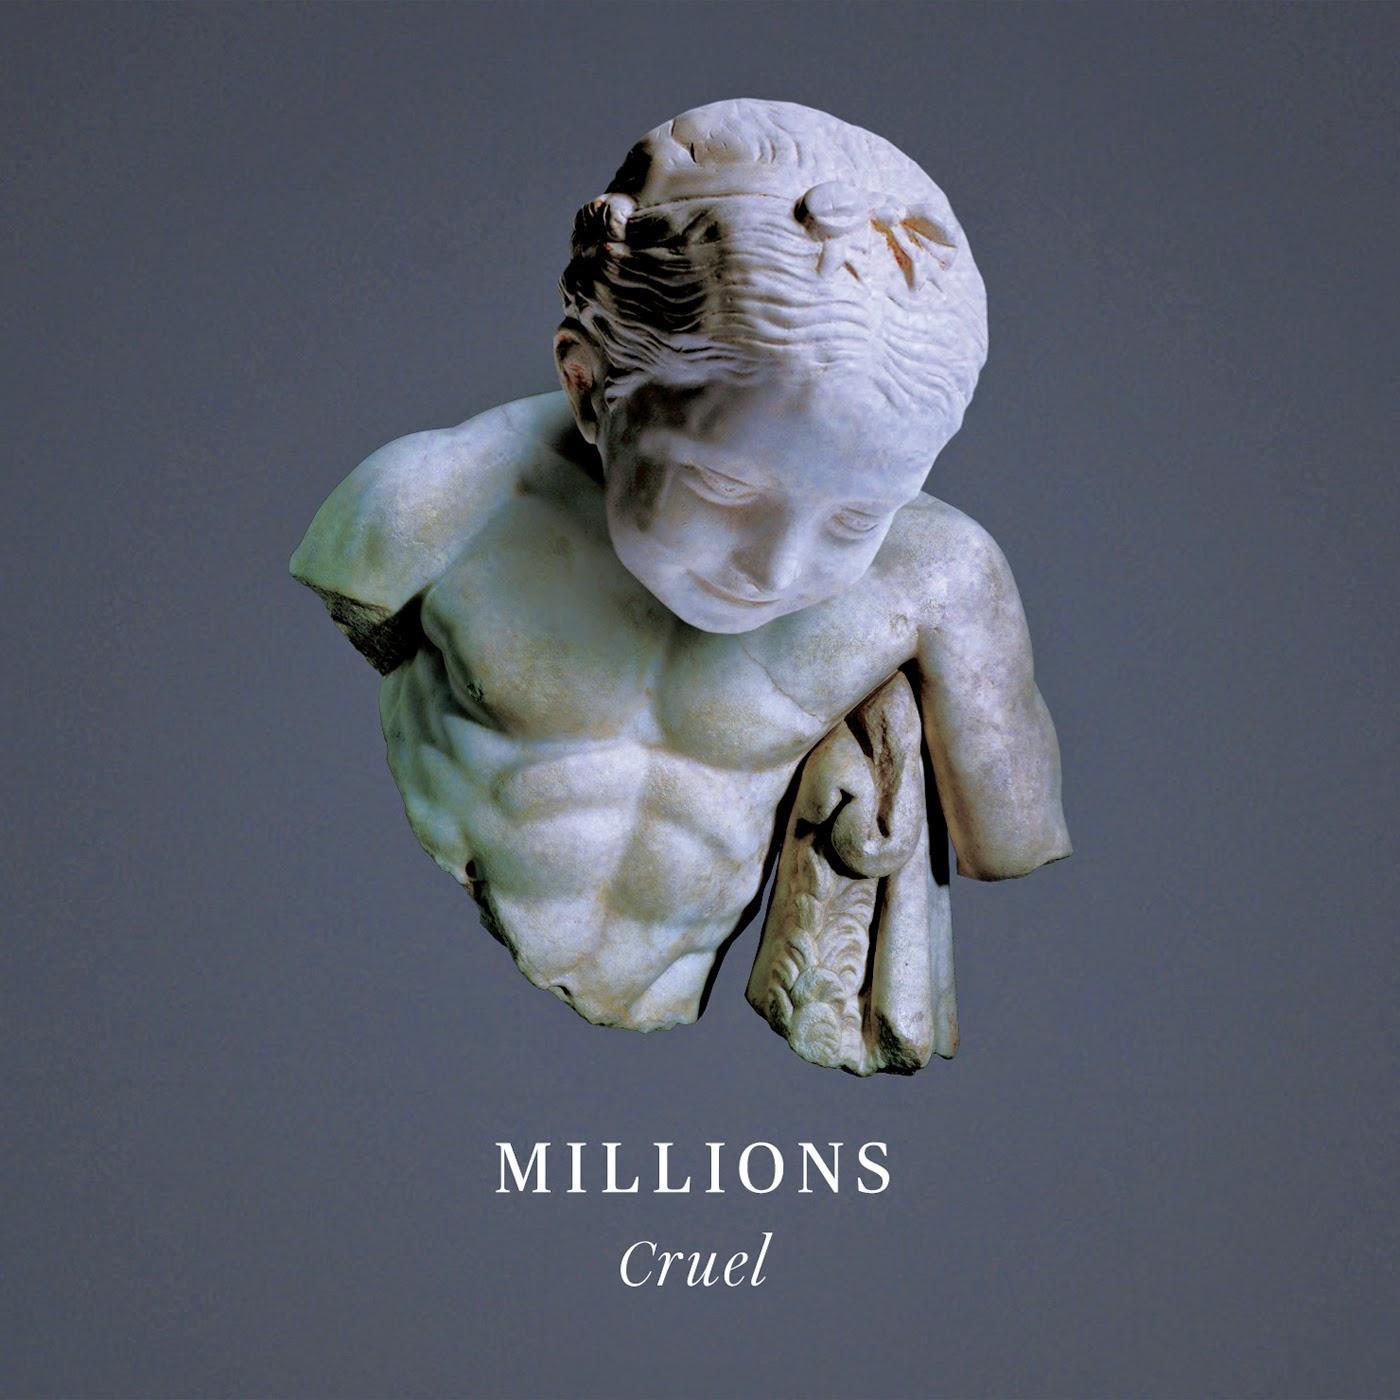 Millions - Cruel EP